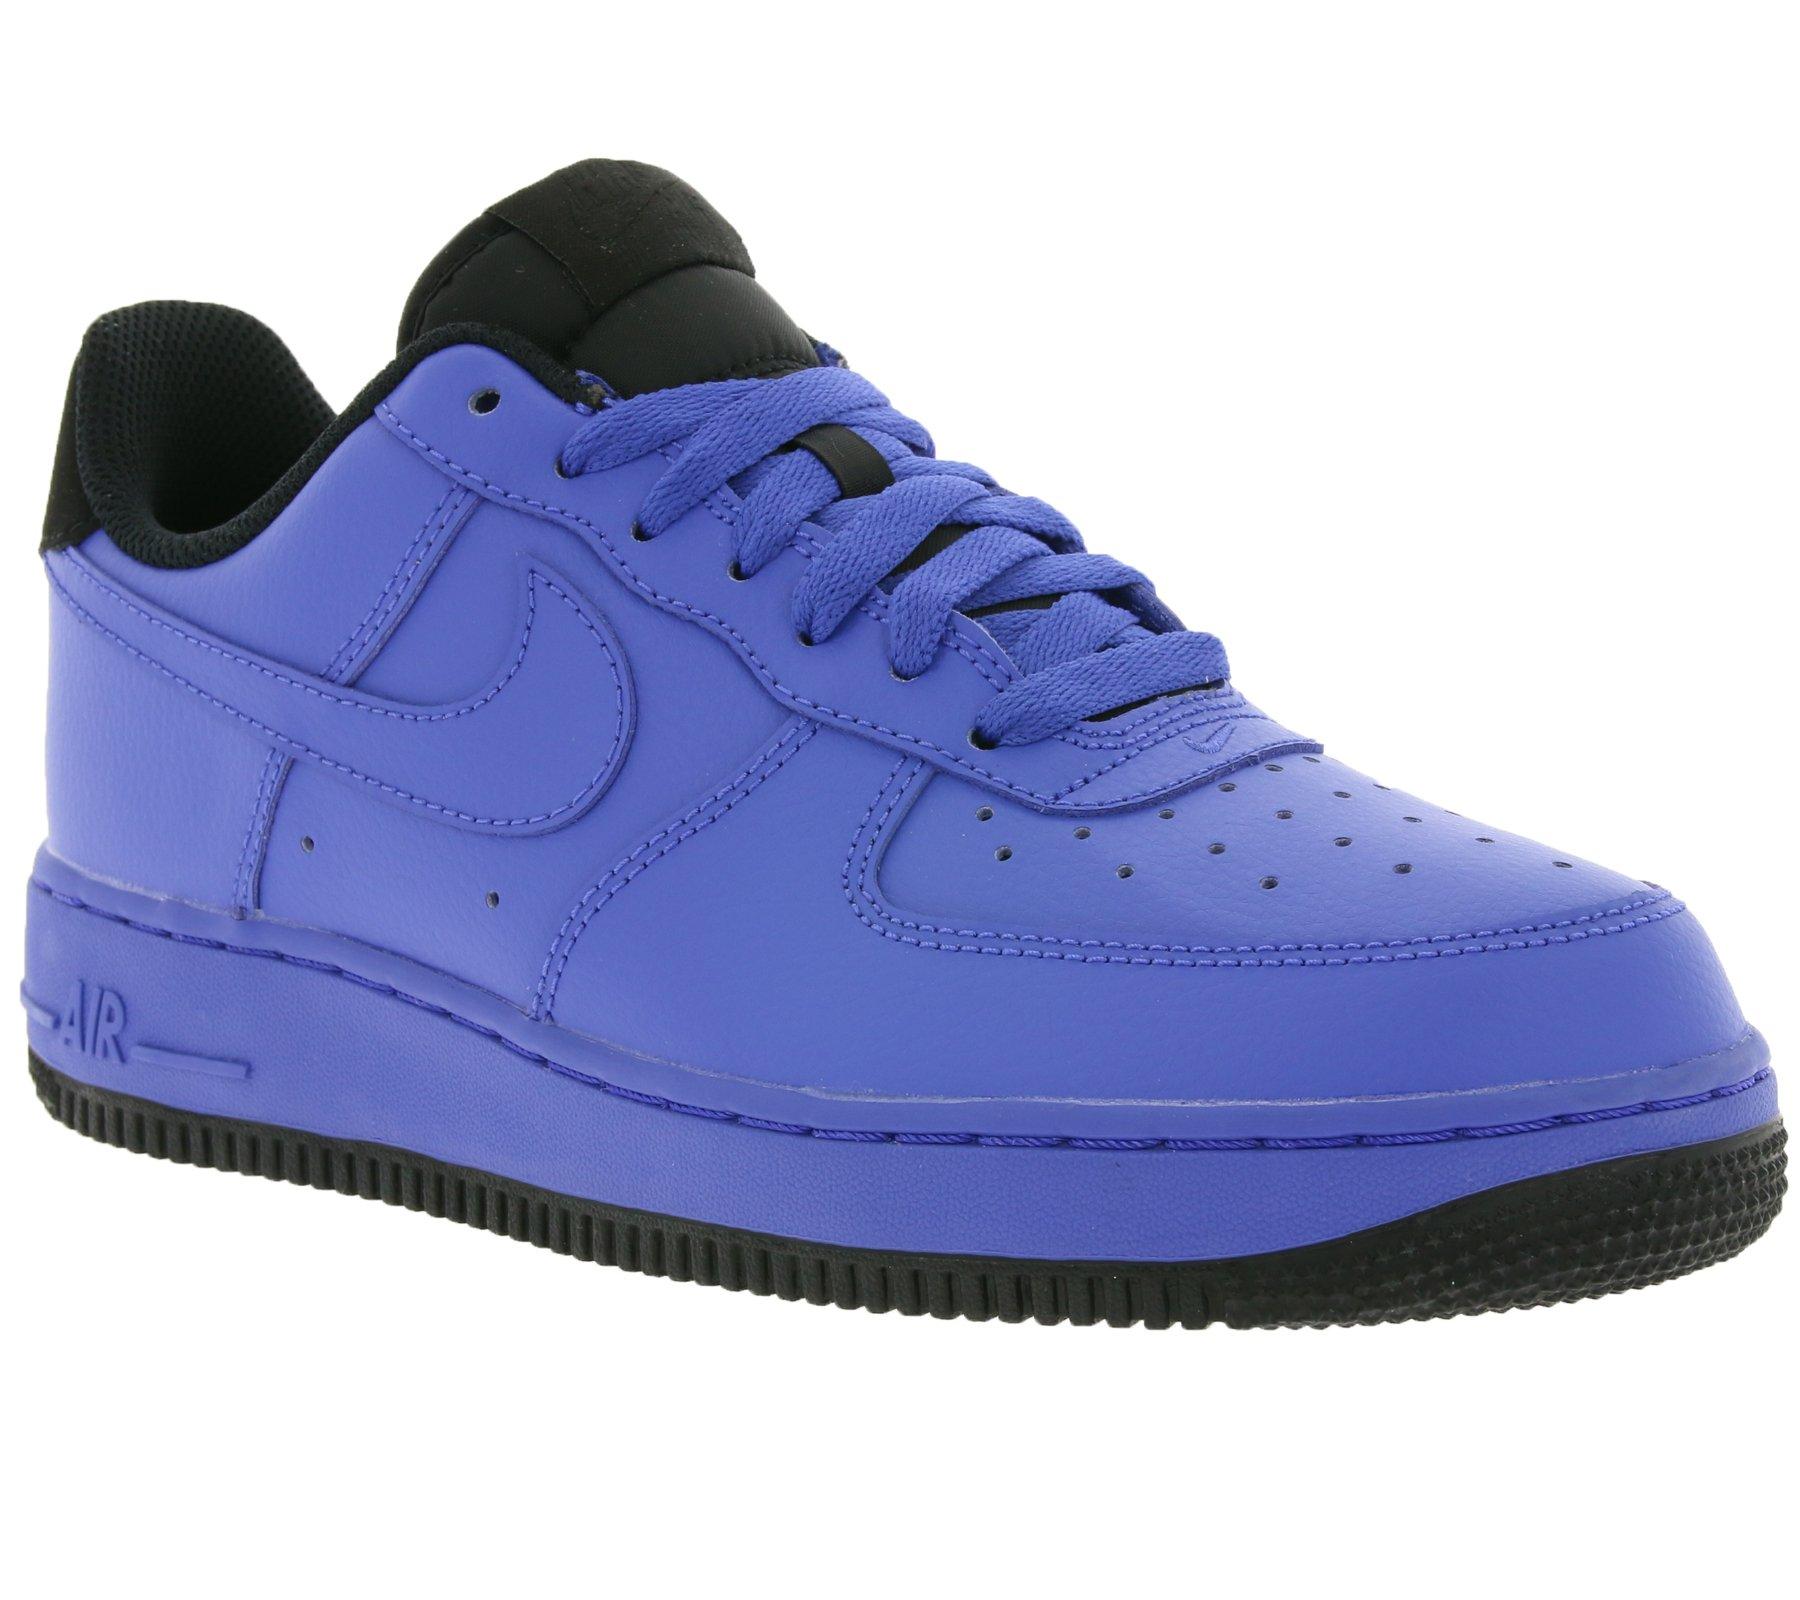 Galleon Nike Air Force 1 '07 Men's Shoes Comet BlueComet